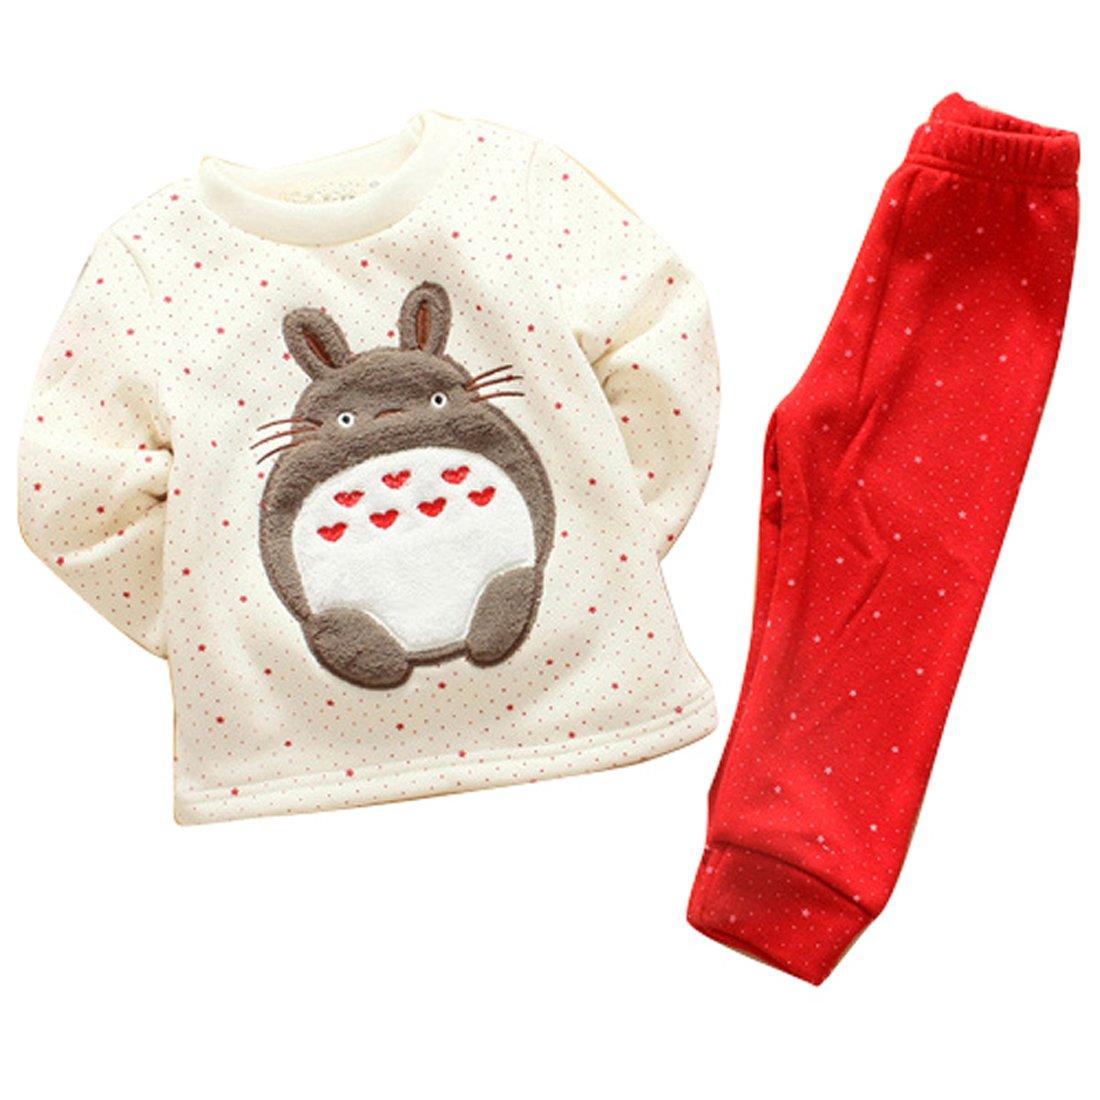 Baby Toddler Girls Boys Fleece Pyjamas Set Long Sleeve Winter Pjs Sleepsuit Playsuit Loungewear Gaorui E-Commerce Co. Ltd BABBJJF-QE80